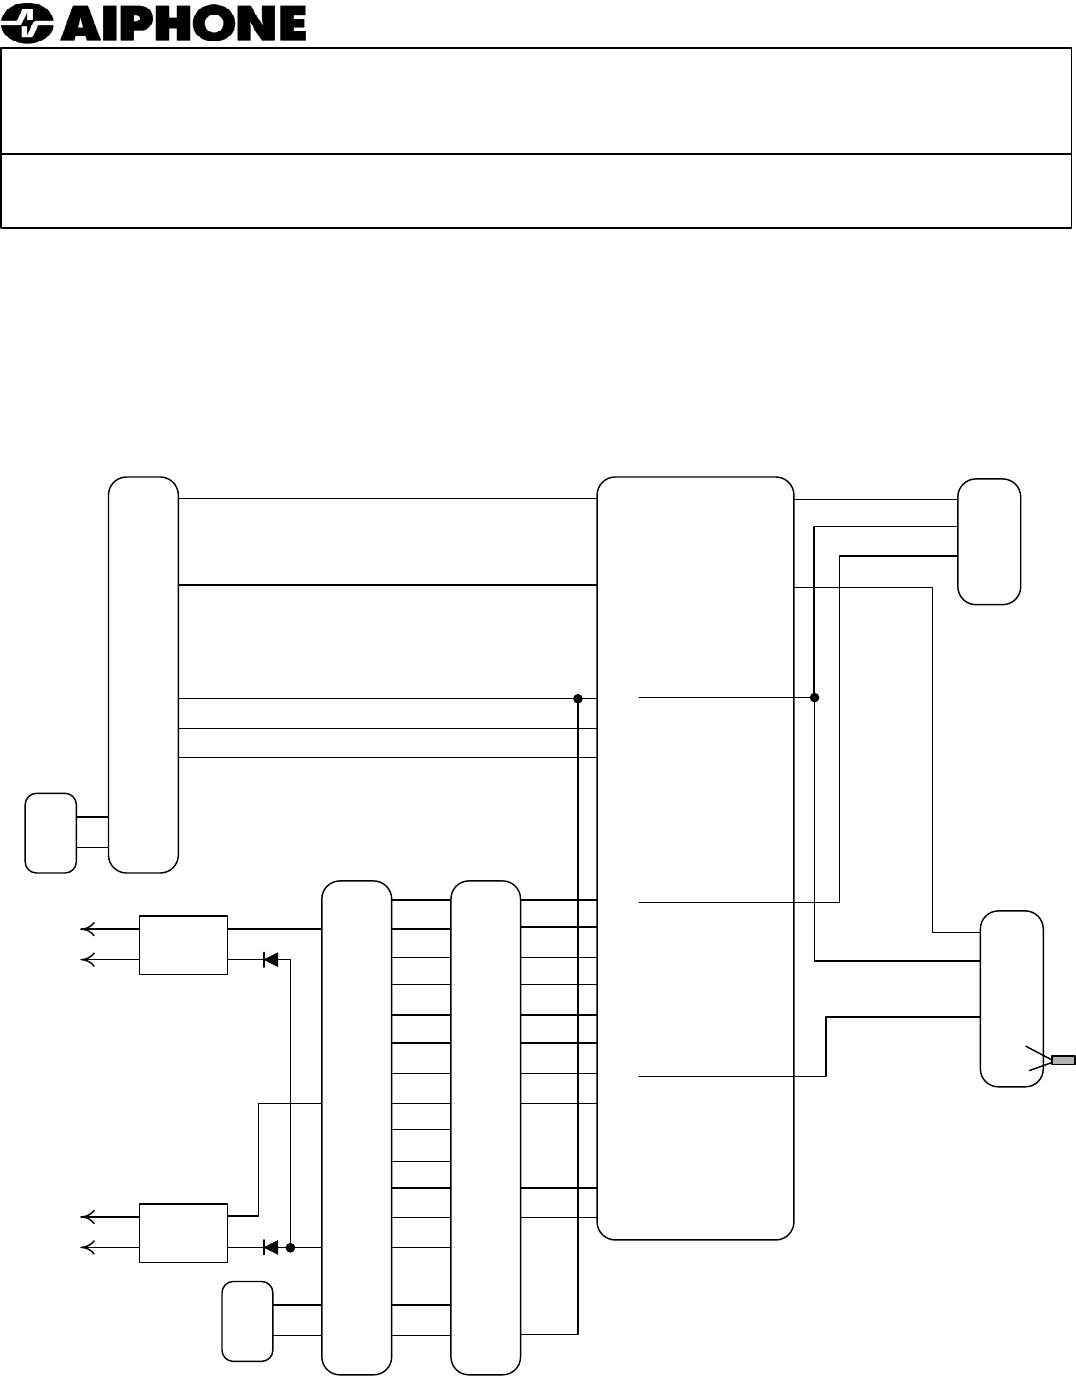 Incredible Lef 5 Wiring Diagram Wiring Diagram Wiring Cloud Ittabpendurdonanfuldomelitekicepsianuembamohammedshrineorg